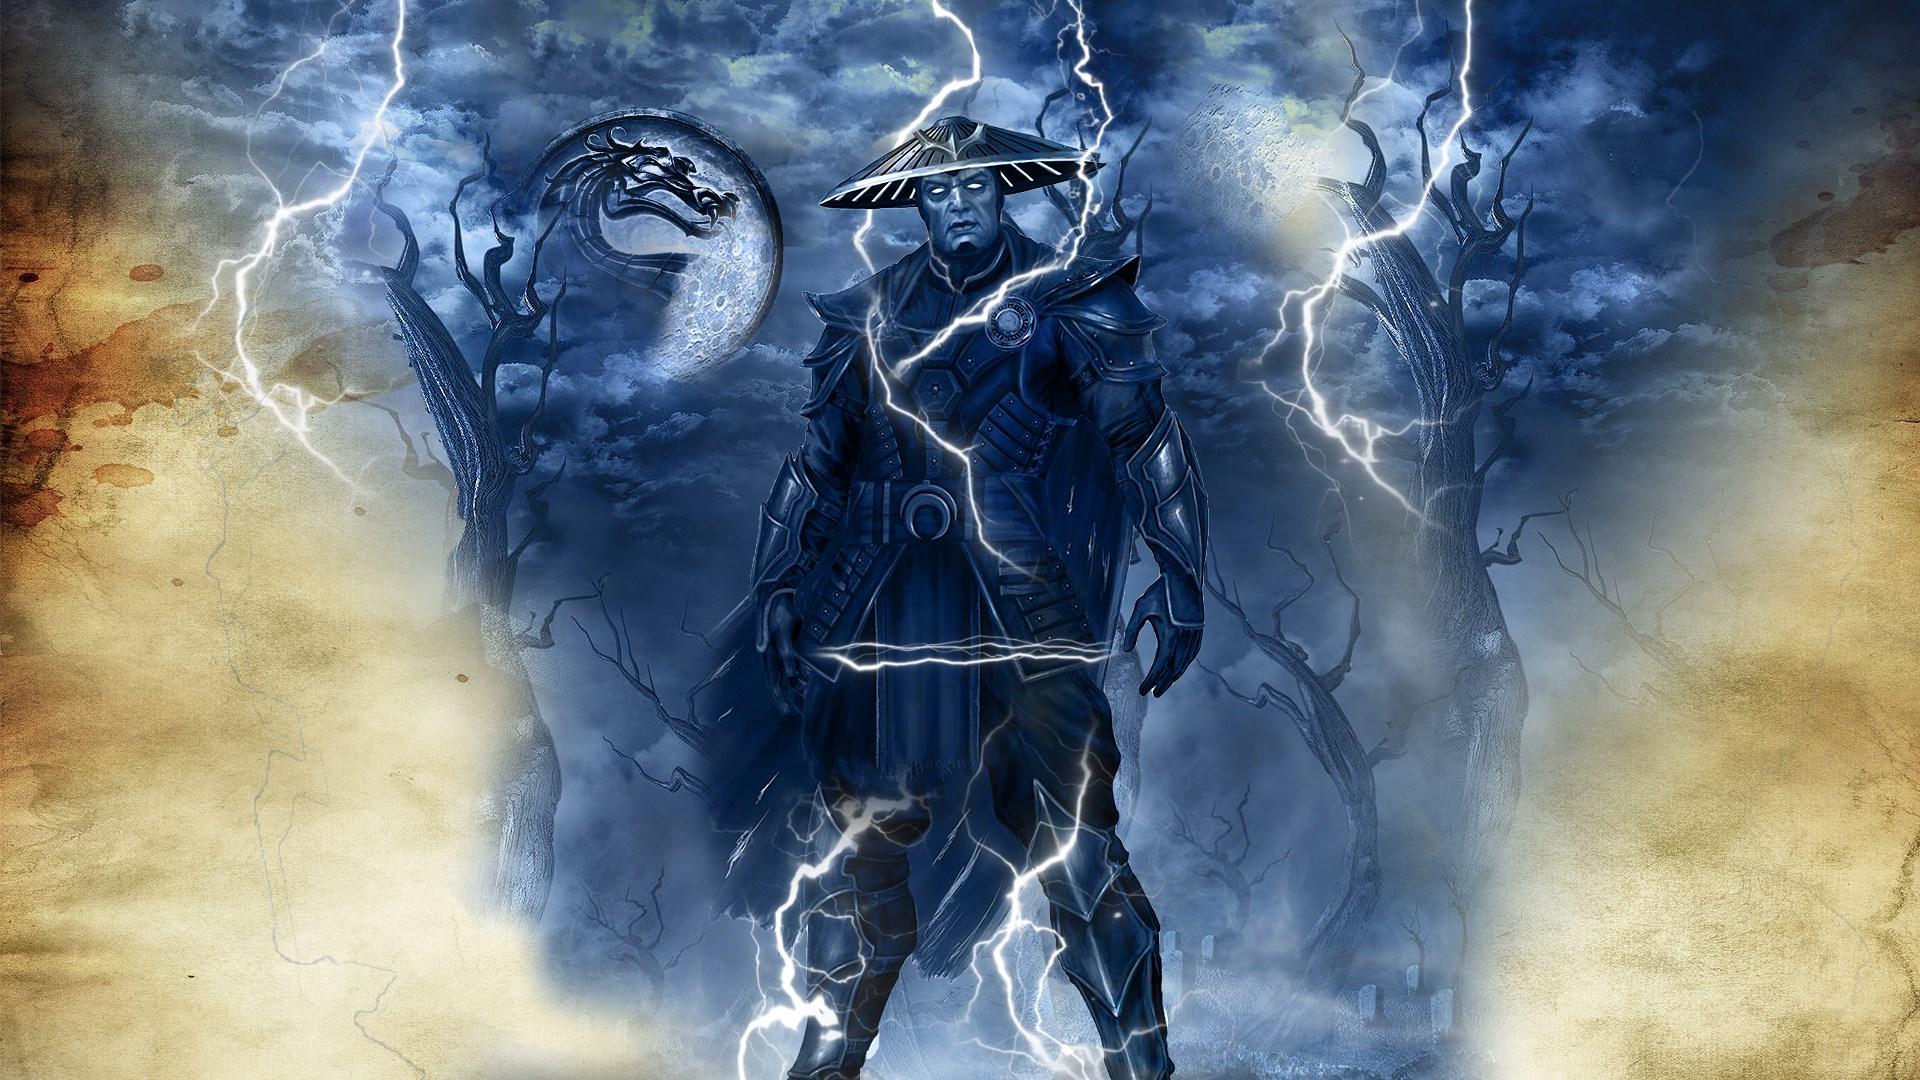 Mortal Kombat Raiden Wallpaper Hd 1920x1080 Wallpaper Teahub Io